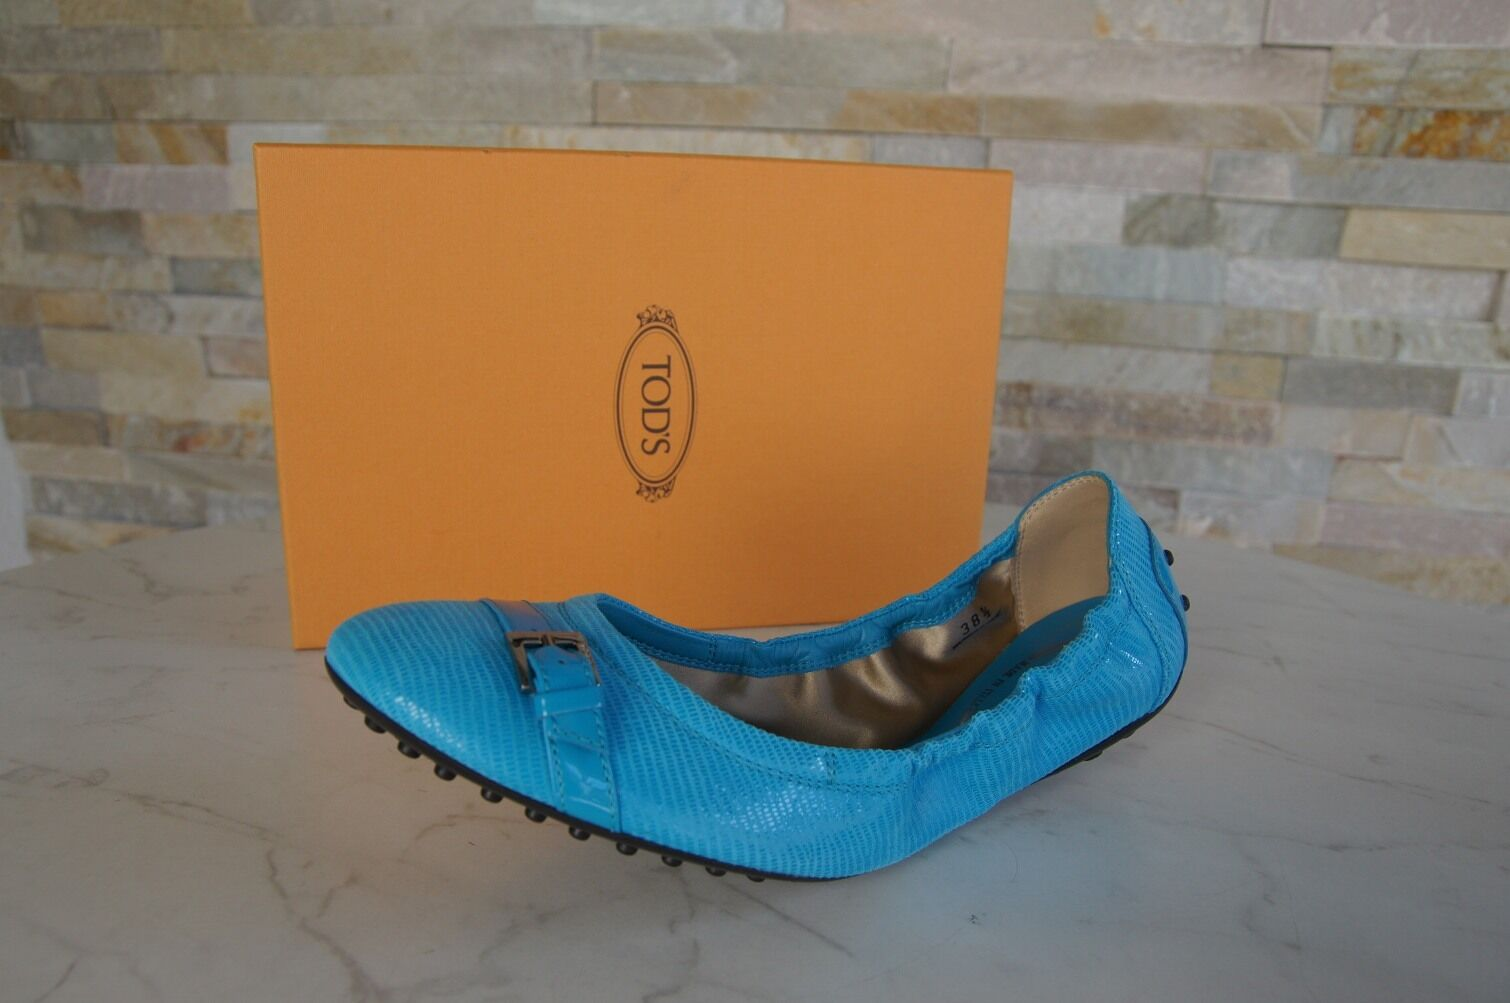 TOD'S Gr 38,5 Ballerinas Slipper Blau Halbschuhe Schuhe schuhe BLAU Blau Slipper NEU 4f15d9